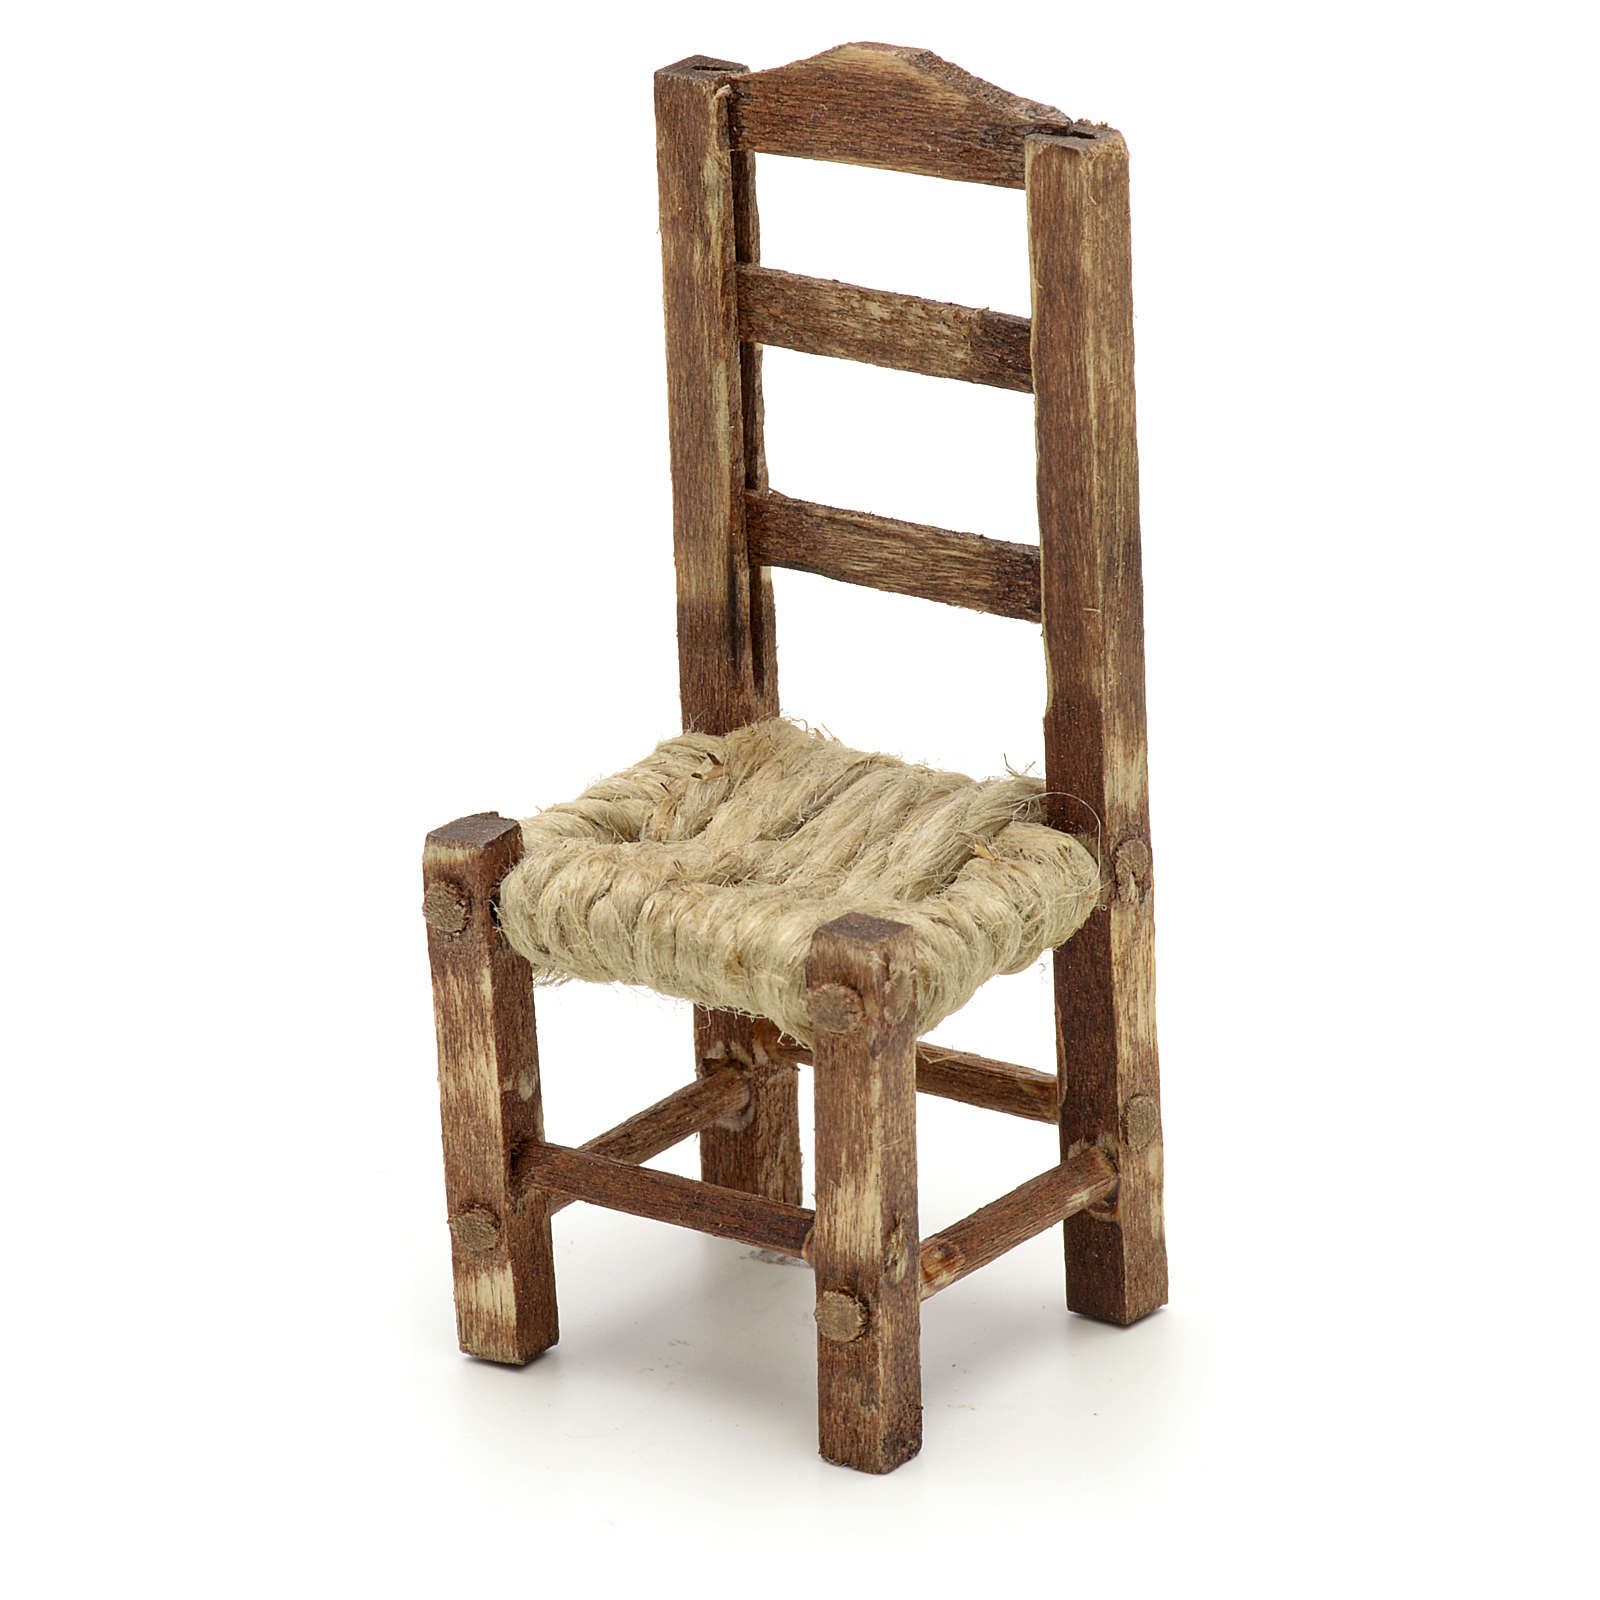 Sedia legno presepe fai da te h 4.5 cm 4